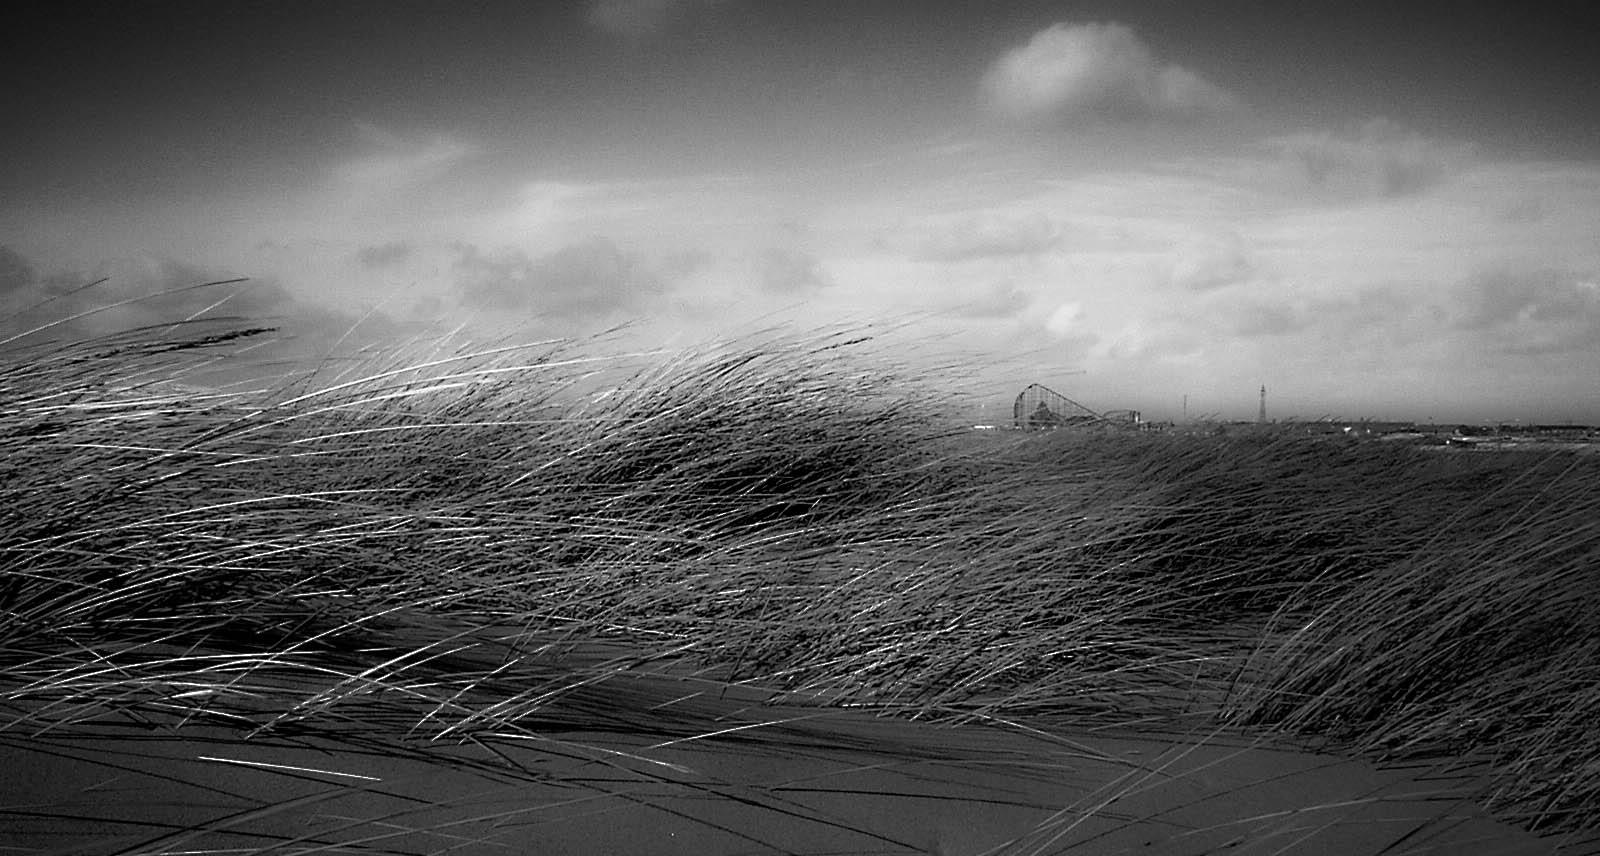 sand-dune-sea-grass-with-blackpool-tower-and-pleasure-beach_8089110684_o.jpg